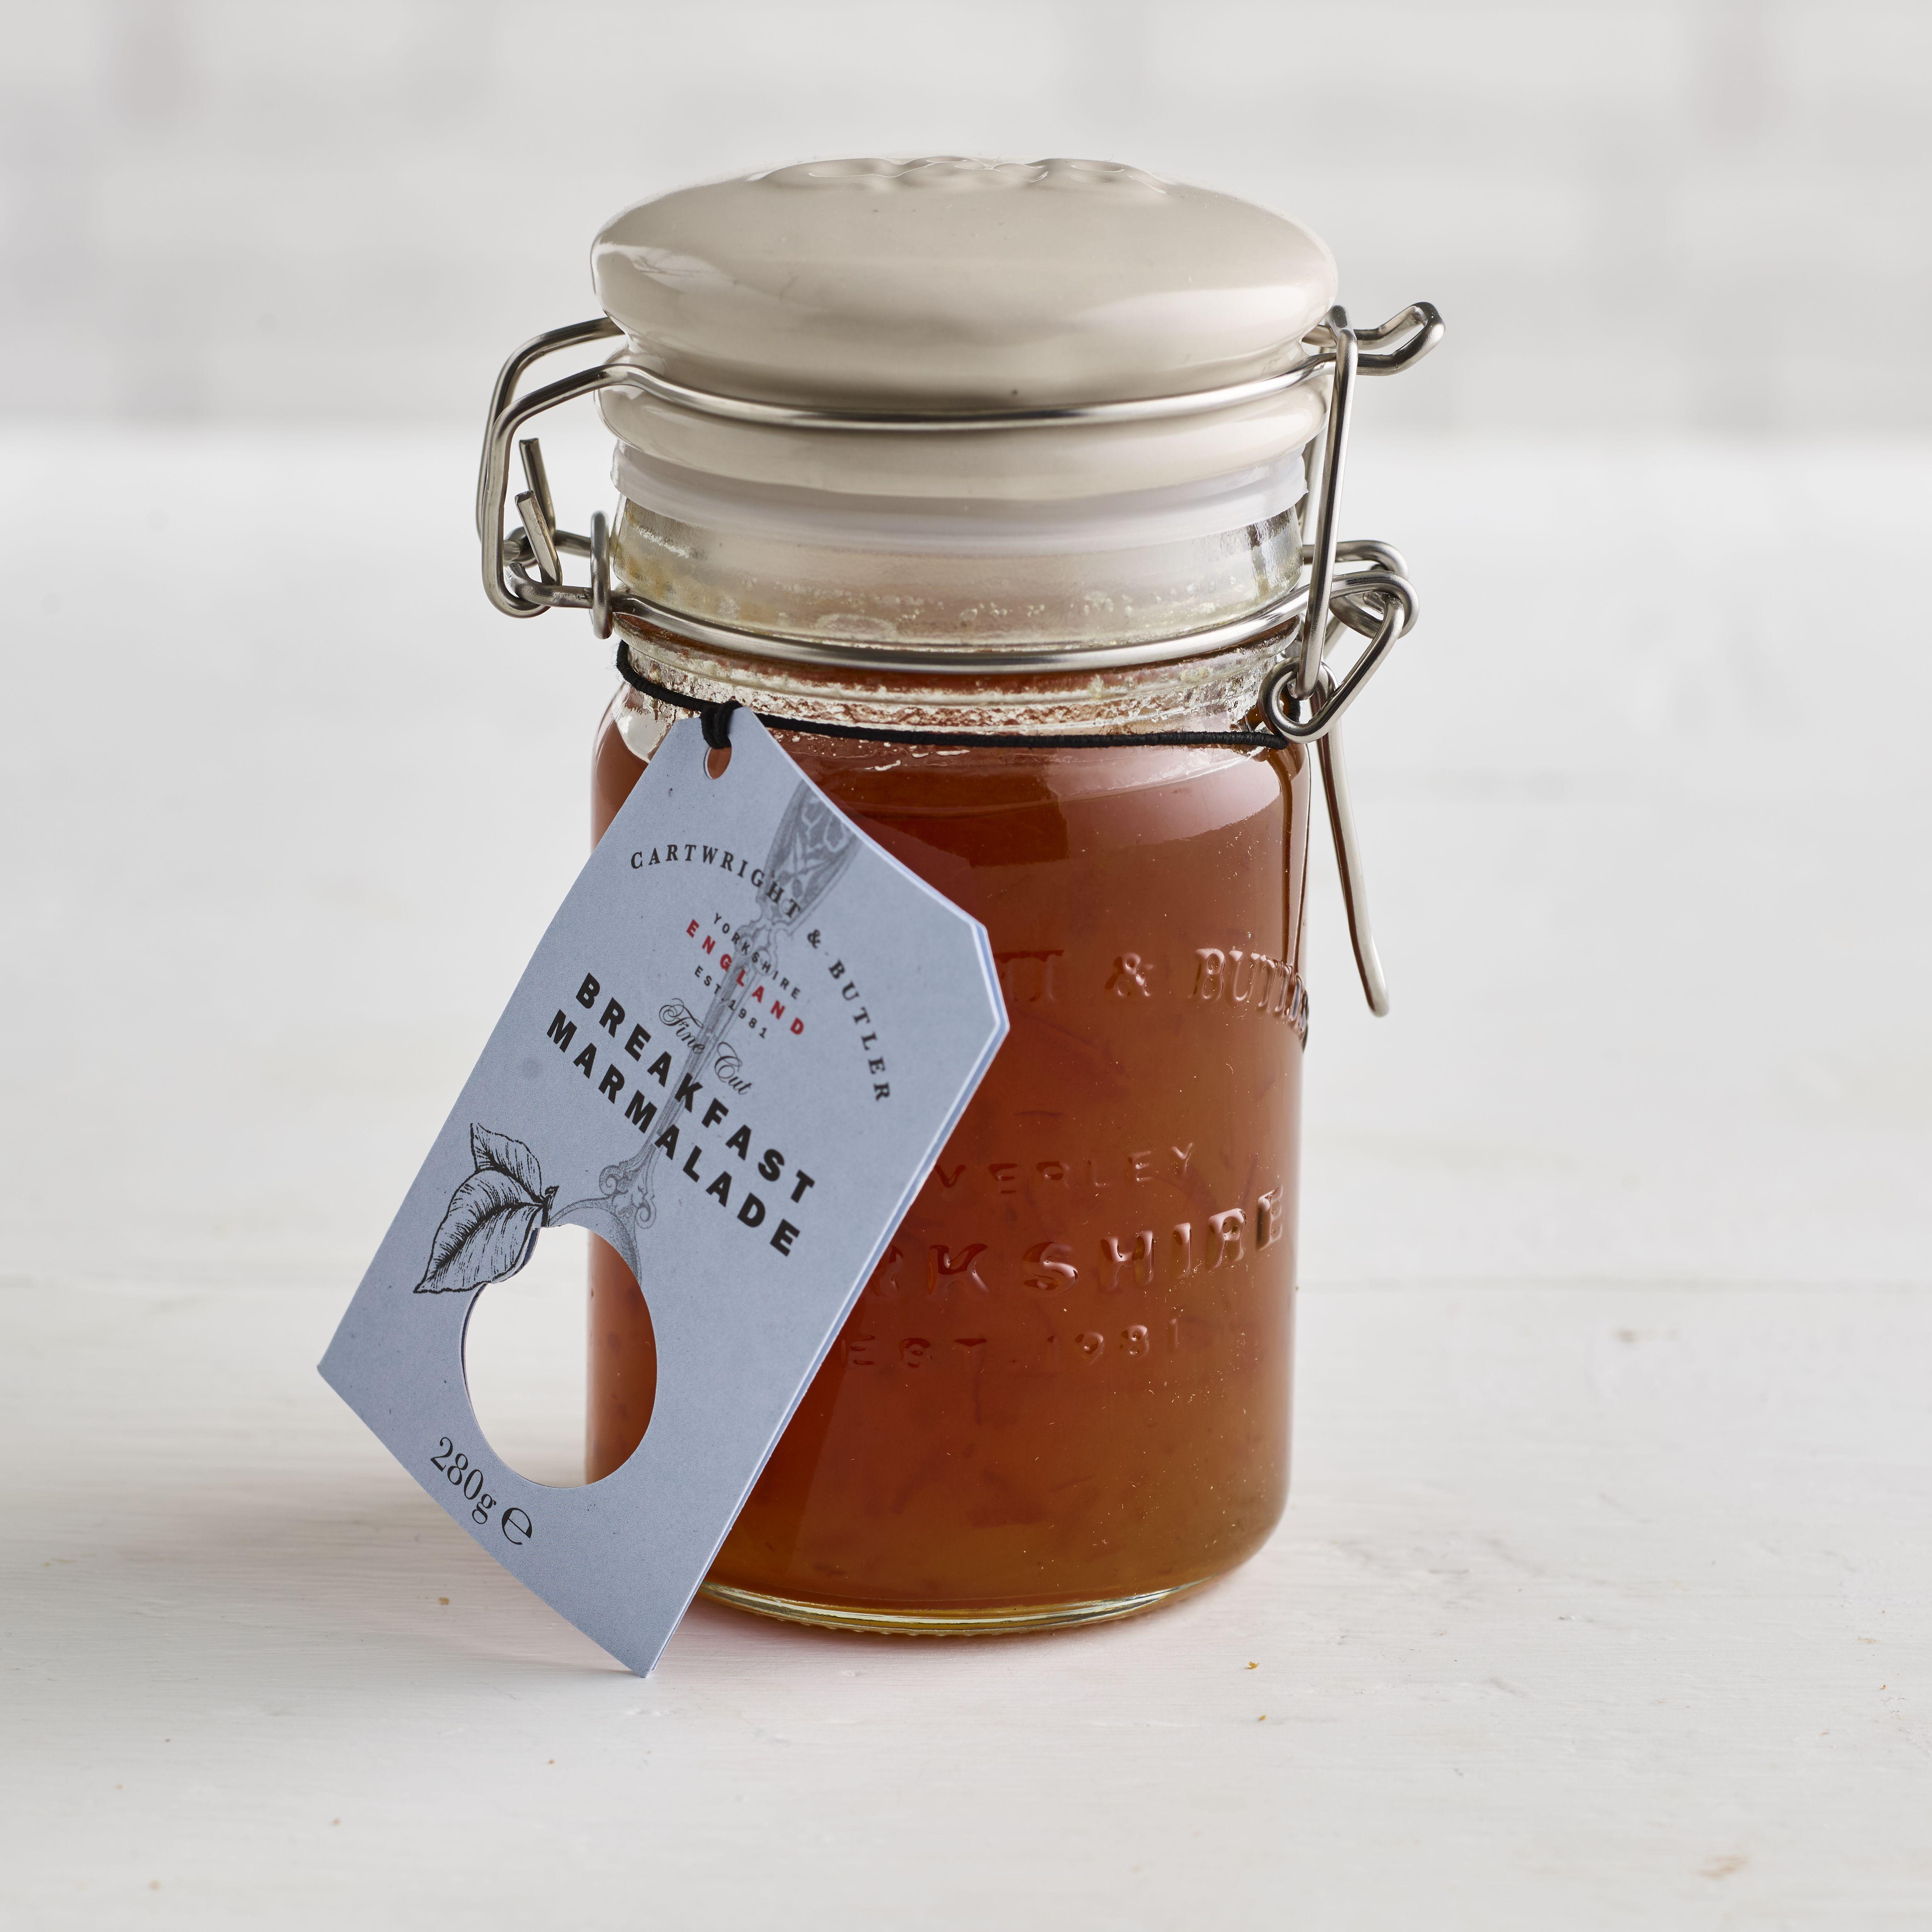 Cartwright & Butler Fine Cut English Breakfast Marmalade, 280g